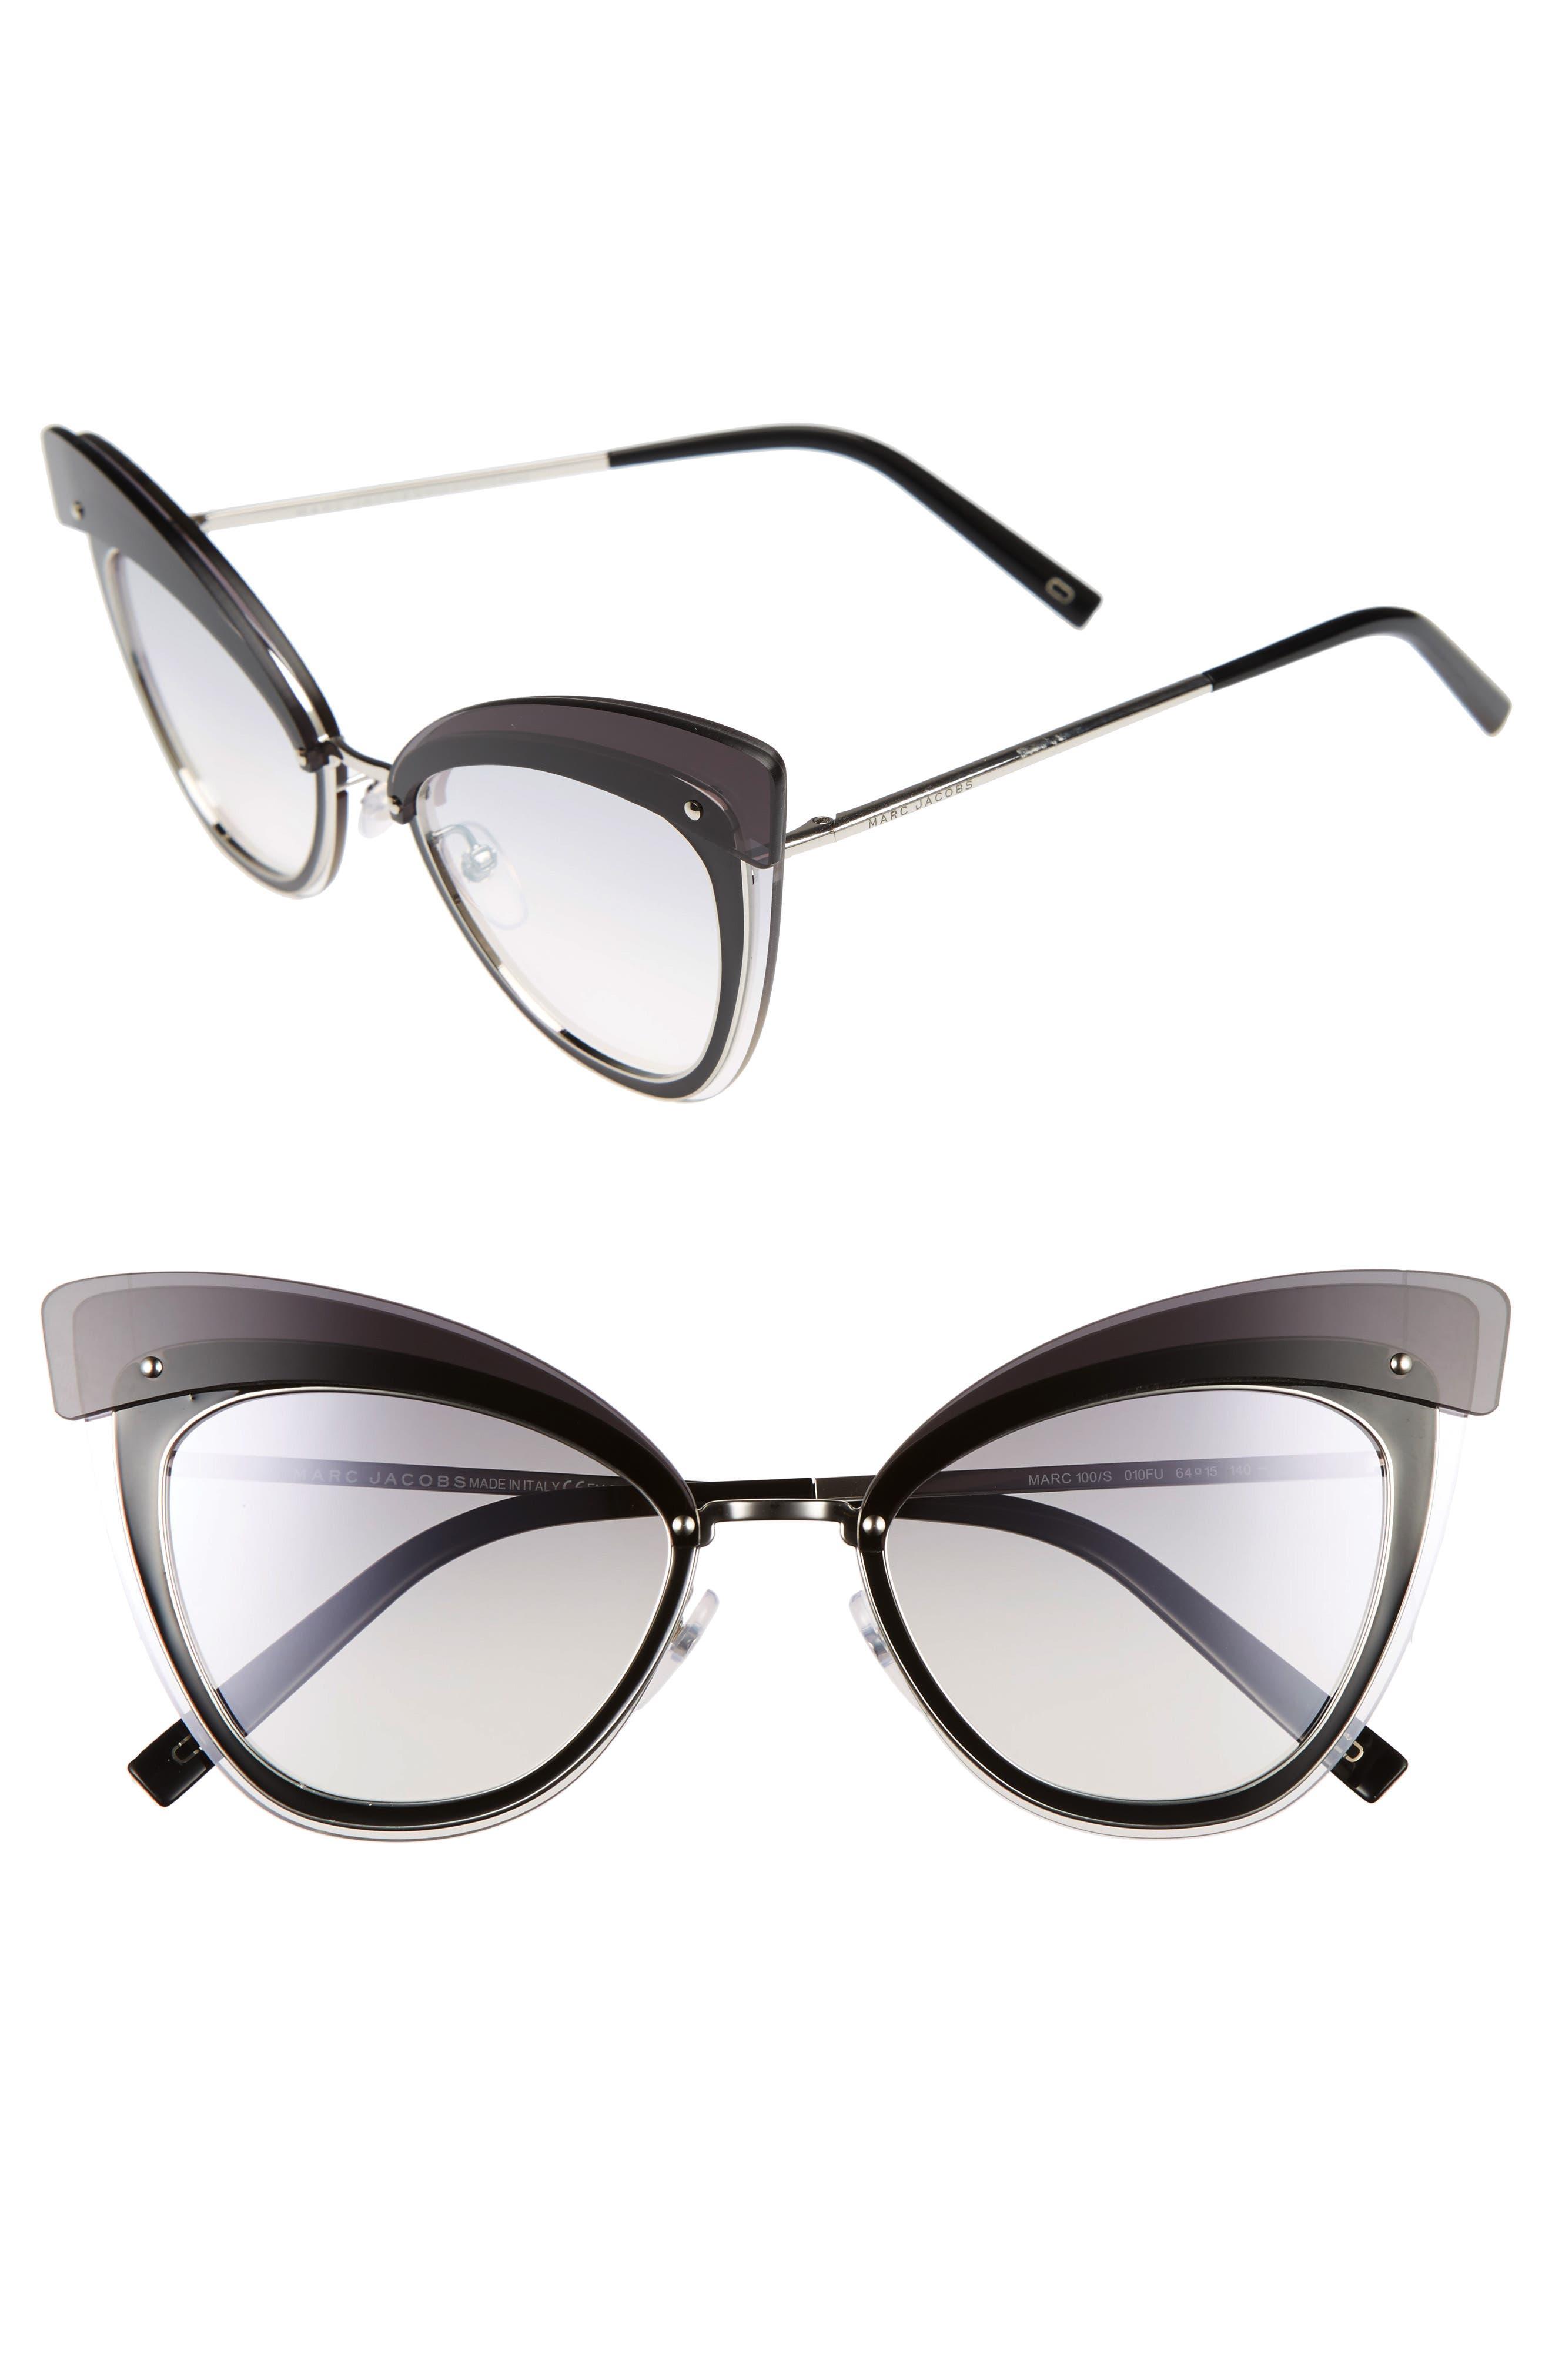 64mm Sunglasses,                             Alternate thumbnail 2, color,                             041